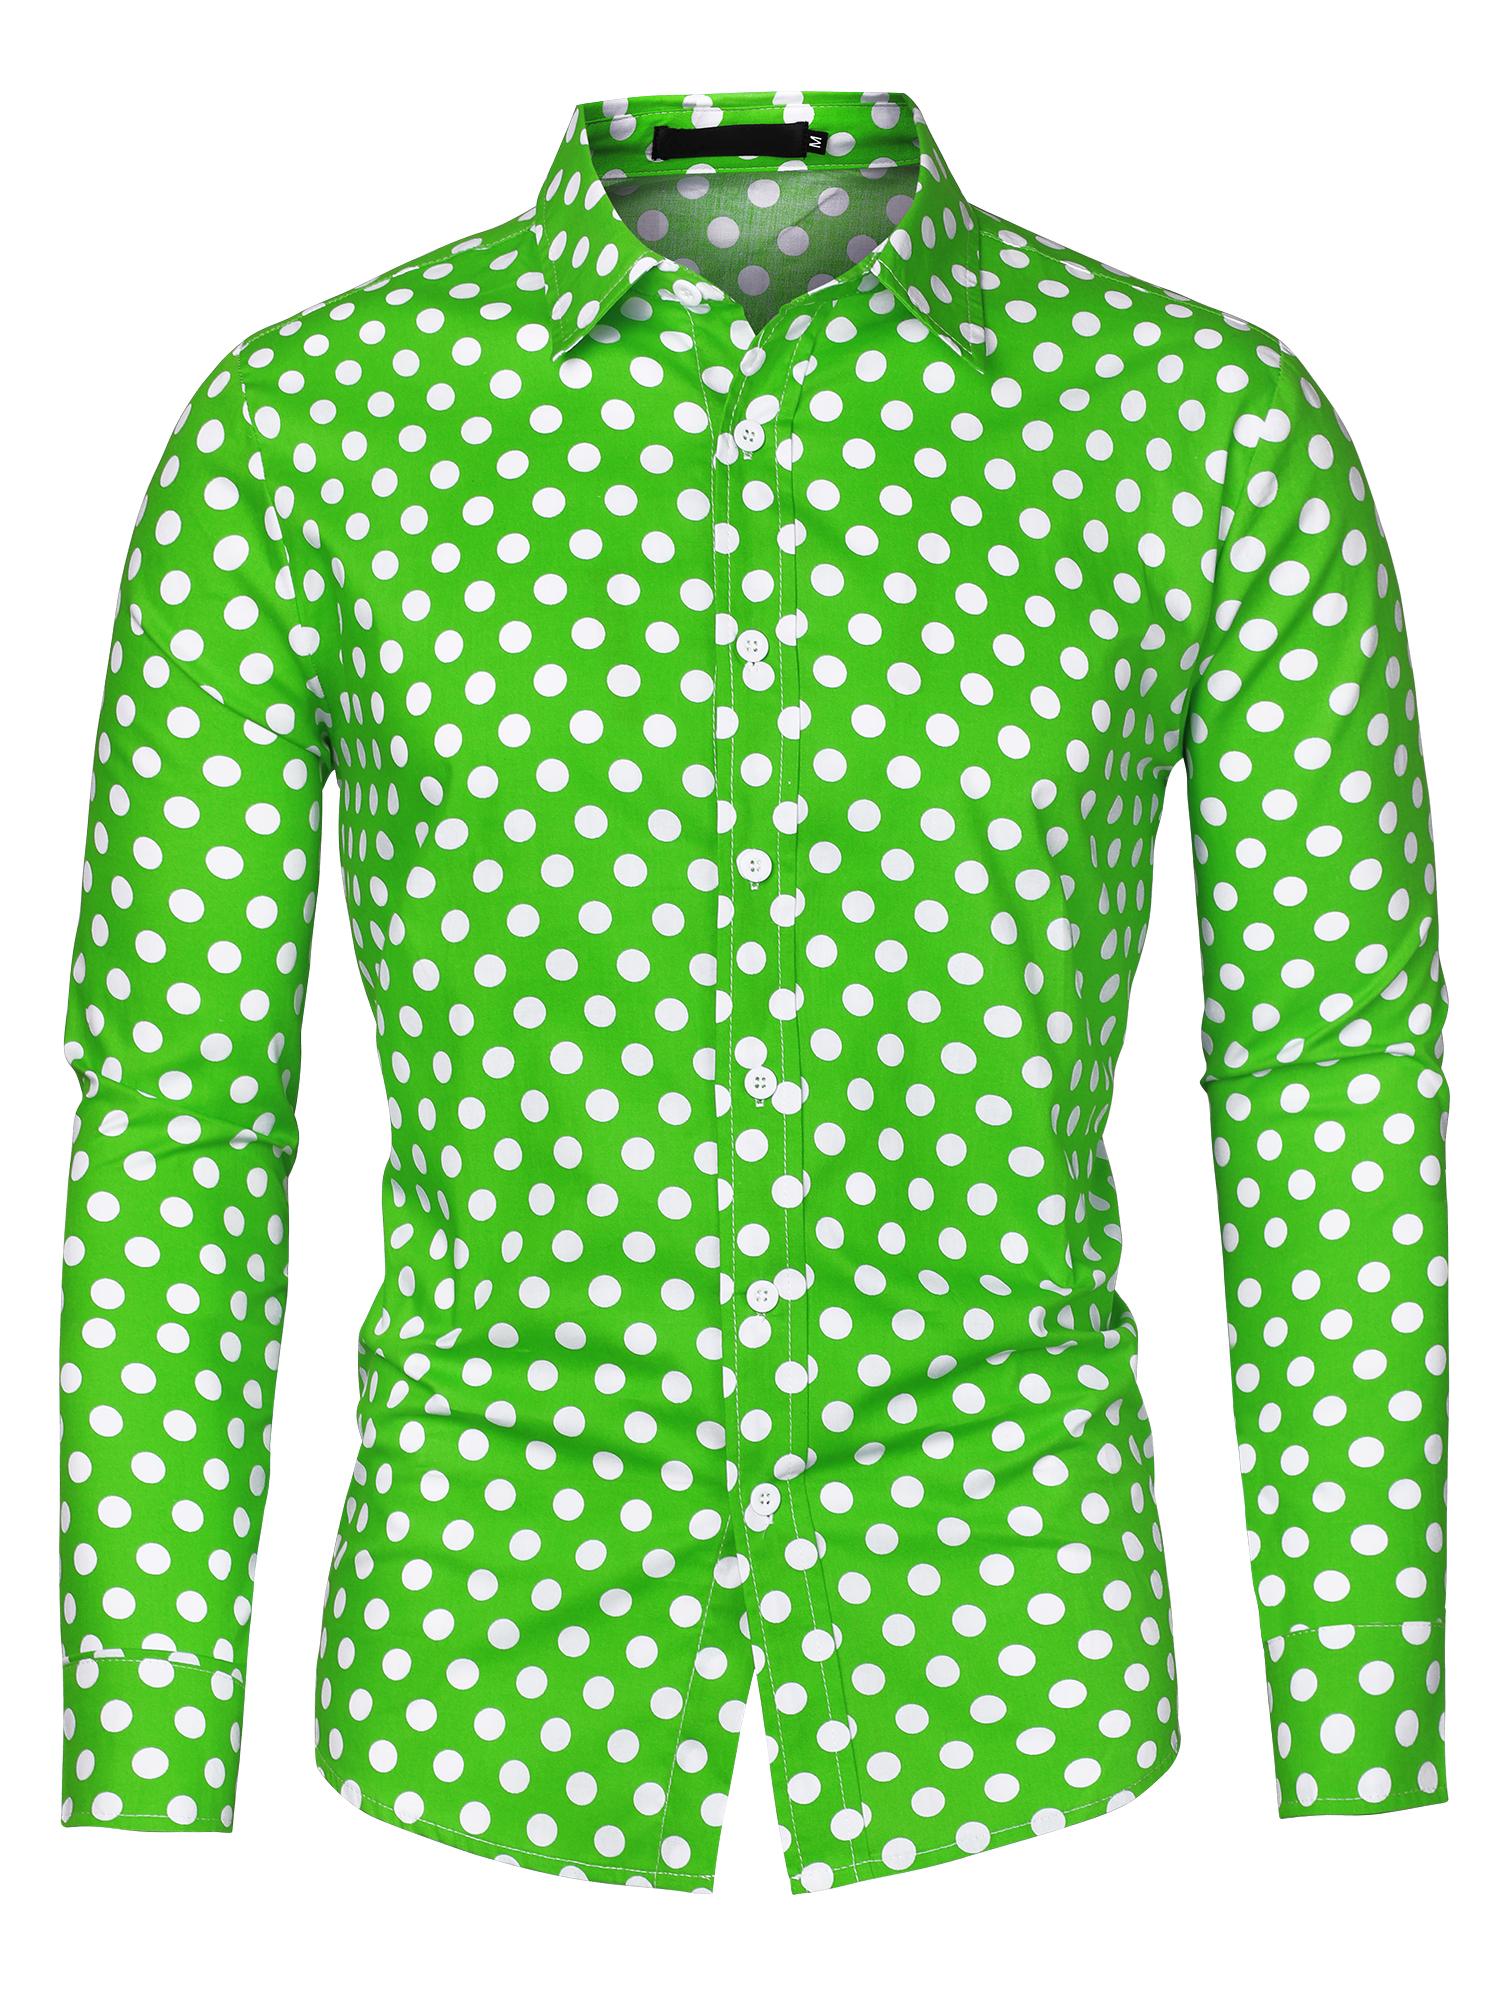 Men 100% Cotton Polka Dots Long Sleeve Slim Fit Dress Shirt Green 34